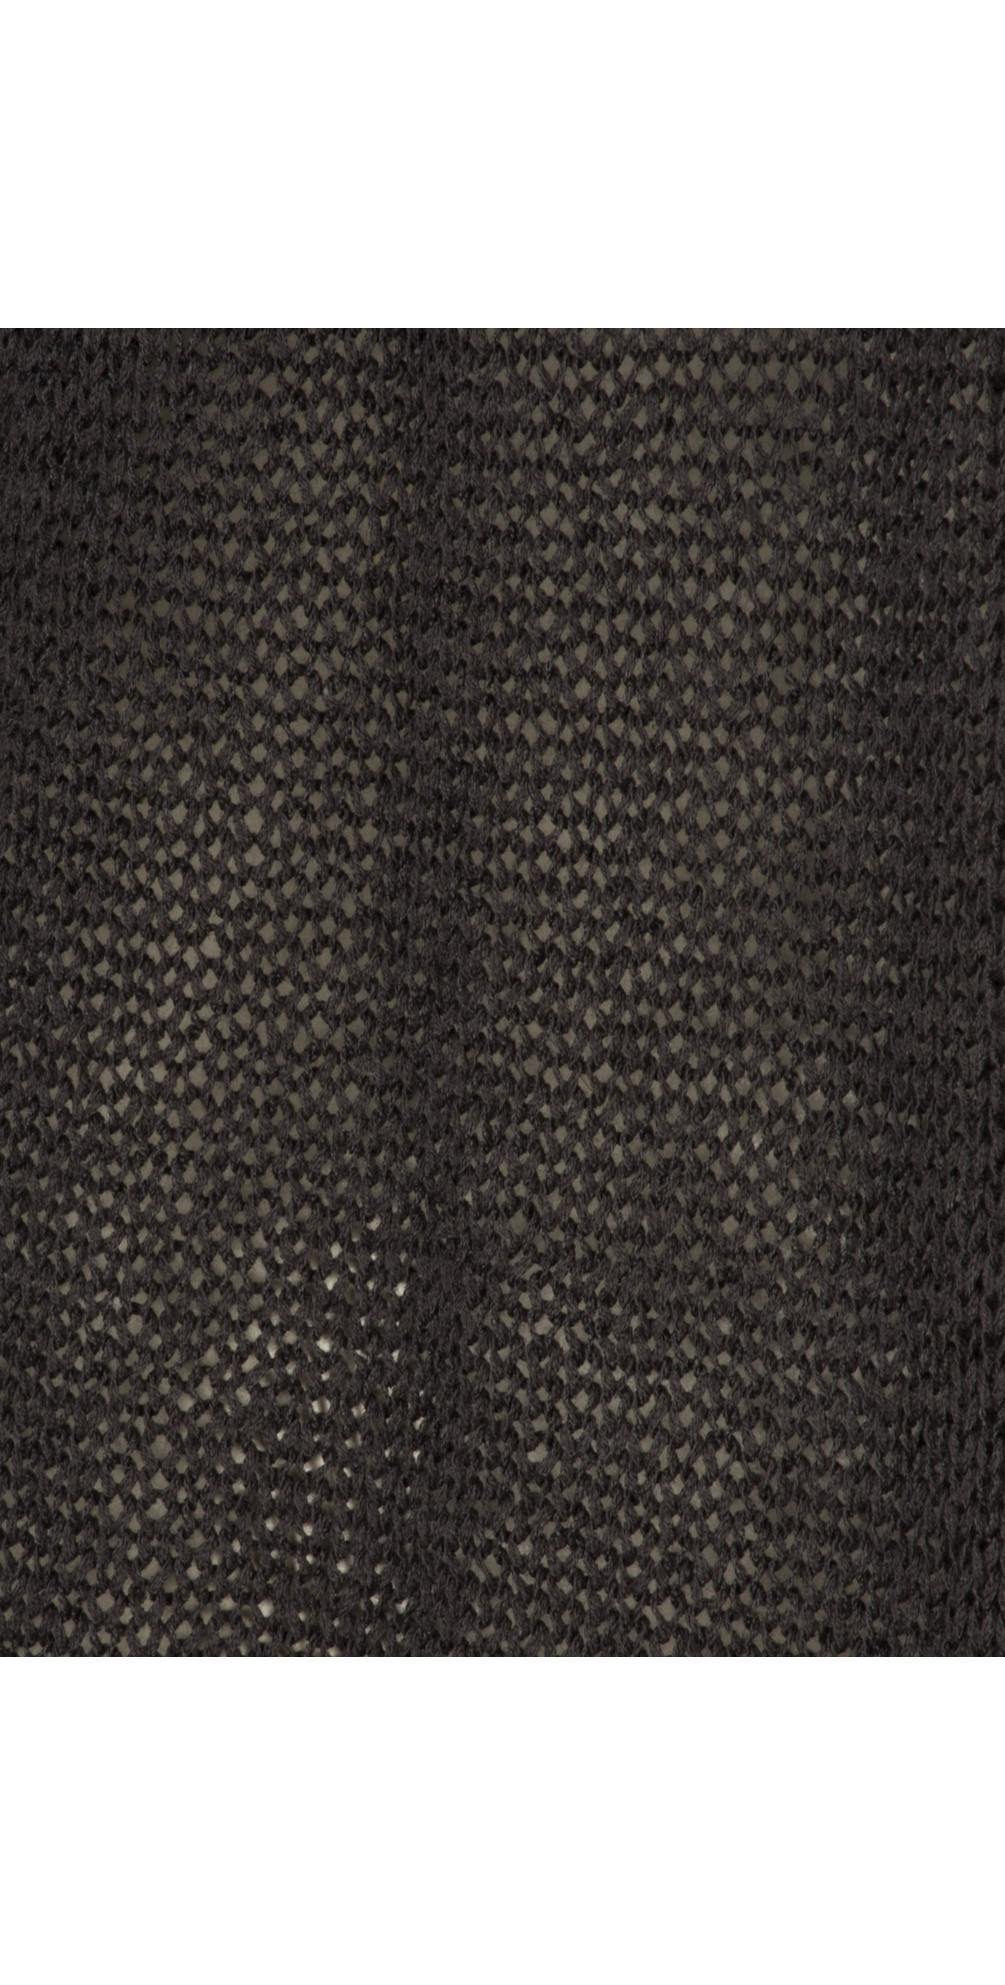 Woven Cotton Cardigan main image